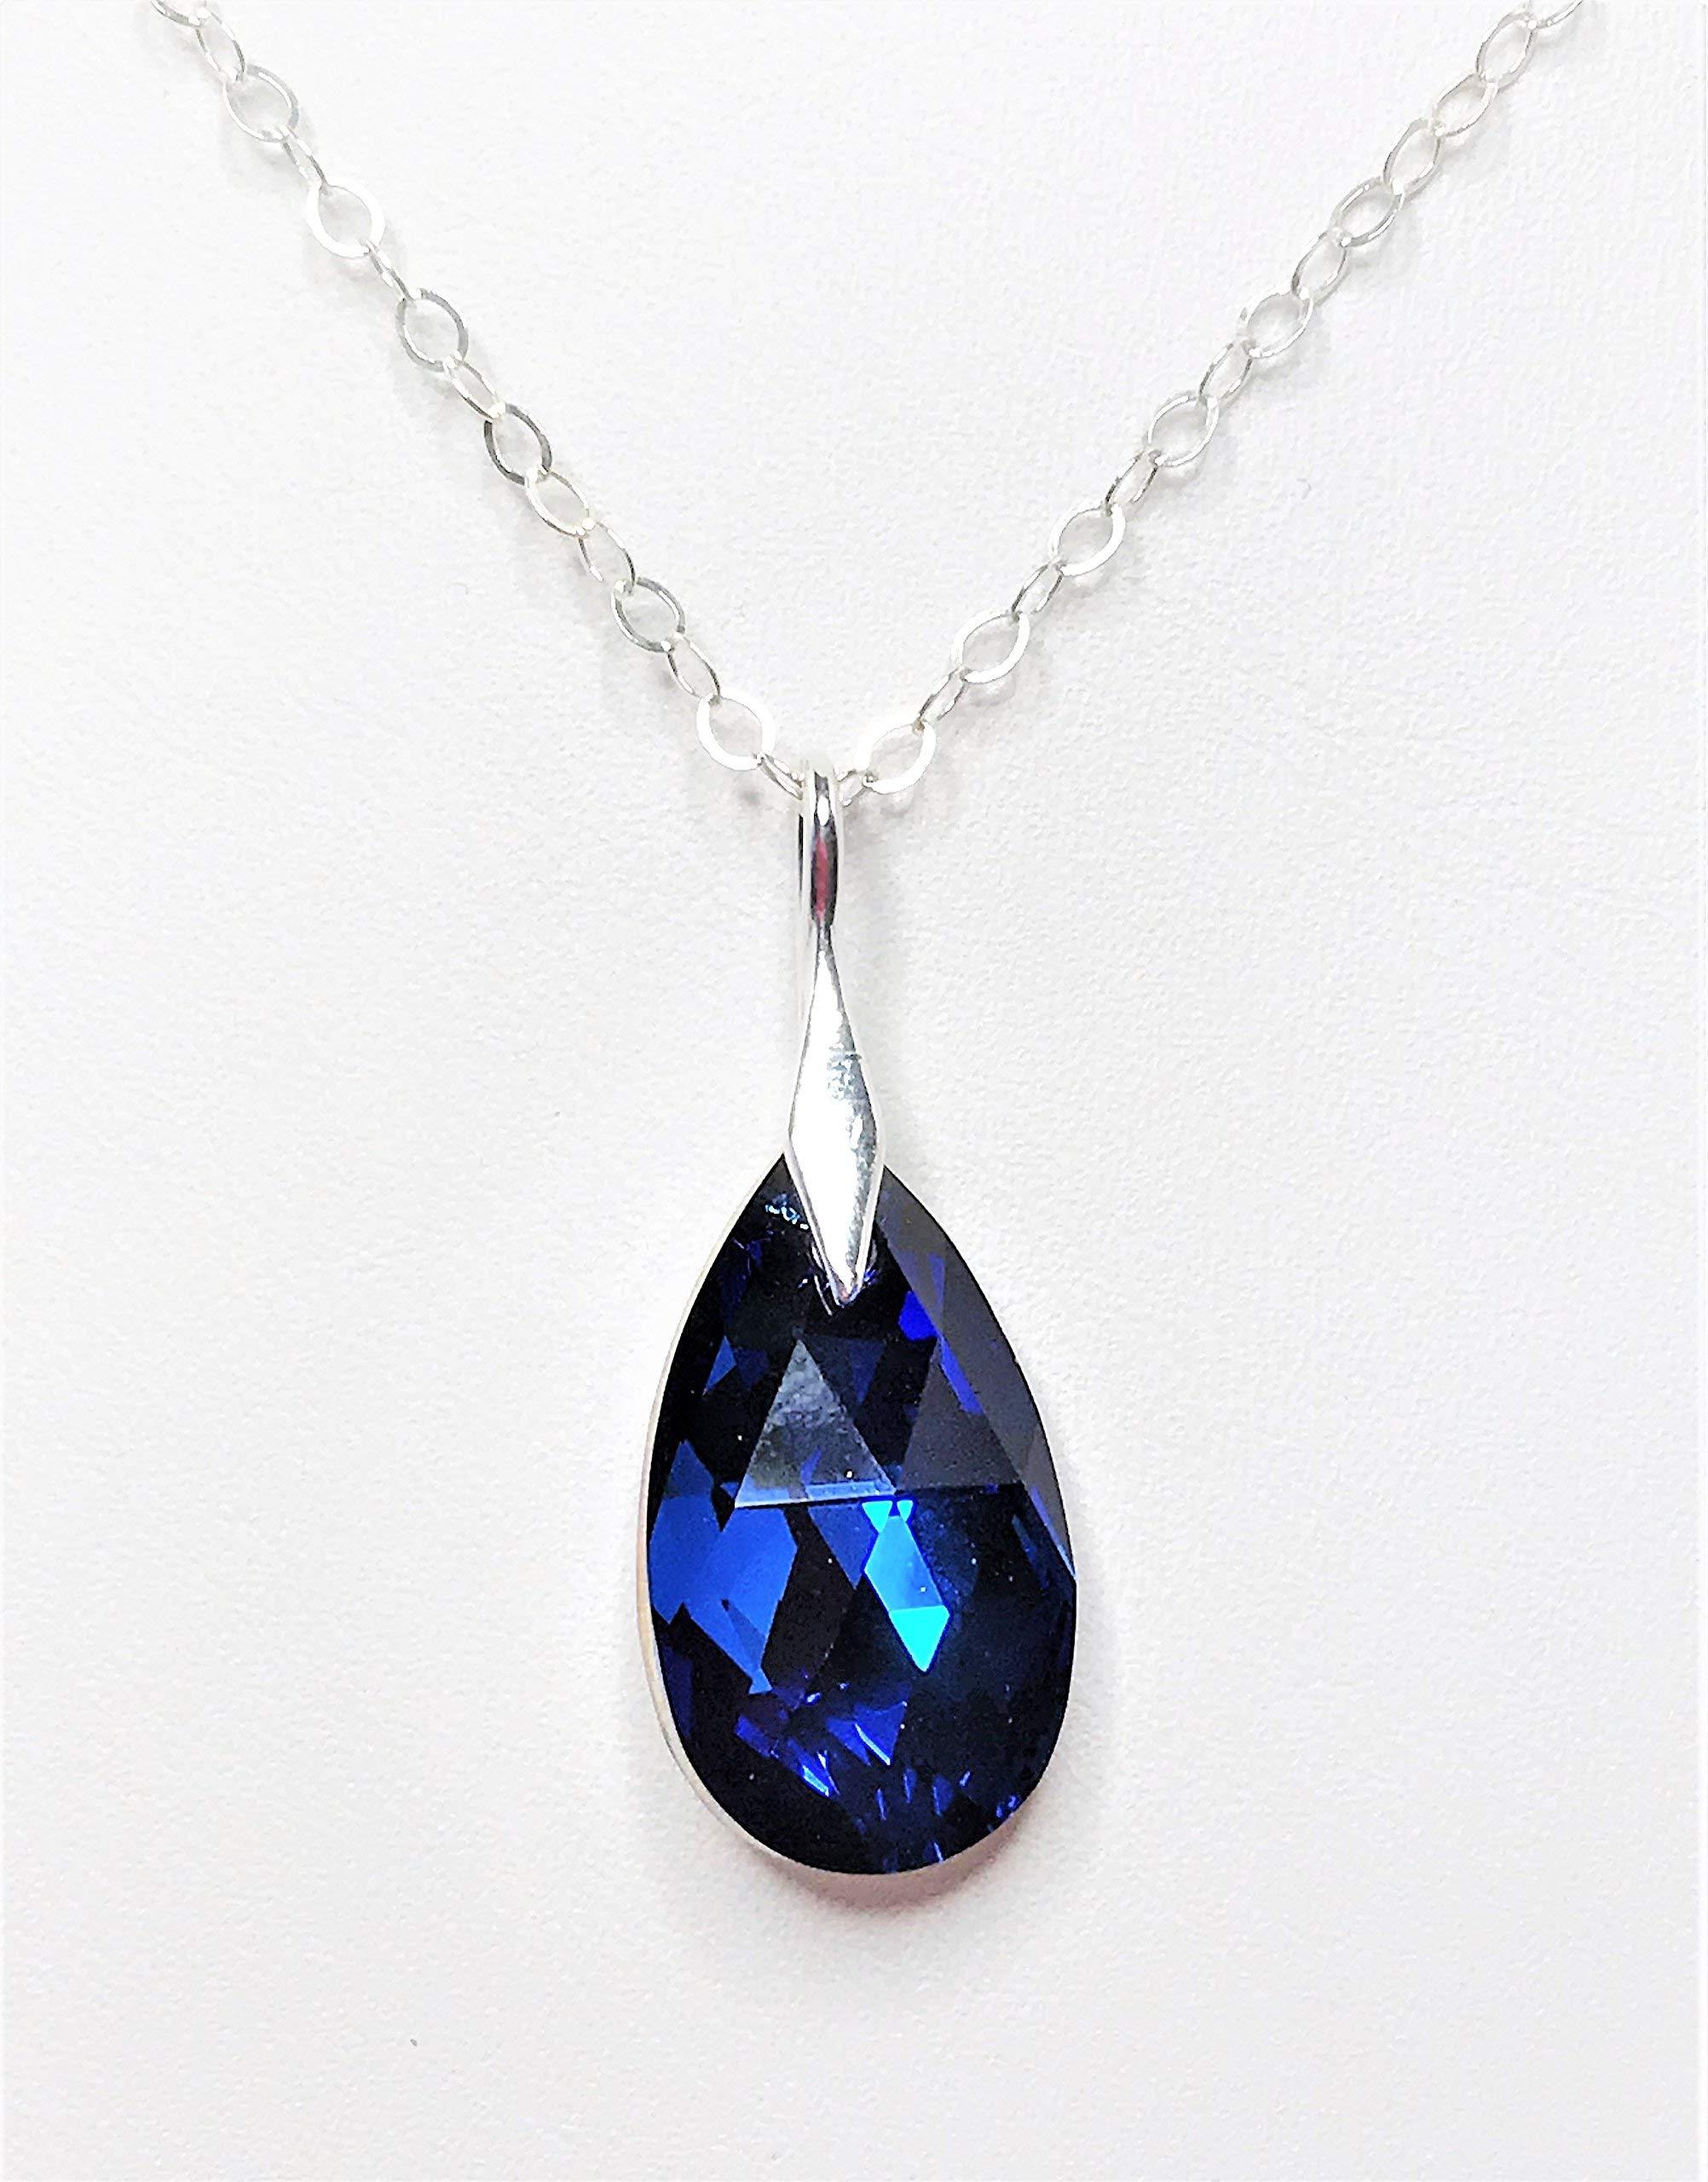 Handmade Capri Blue Swarovski Crystal Teardrop Sterling Silver 18 inch Necklace